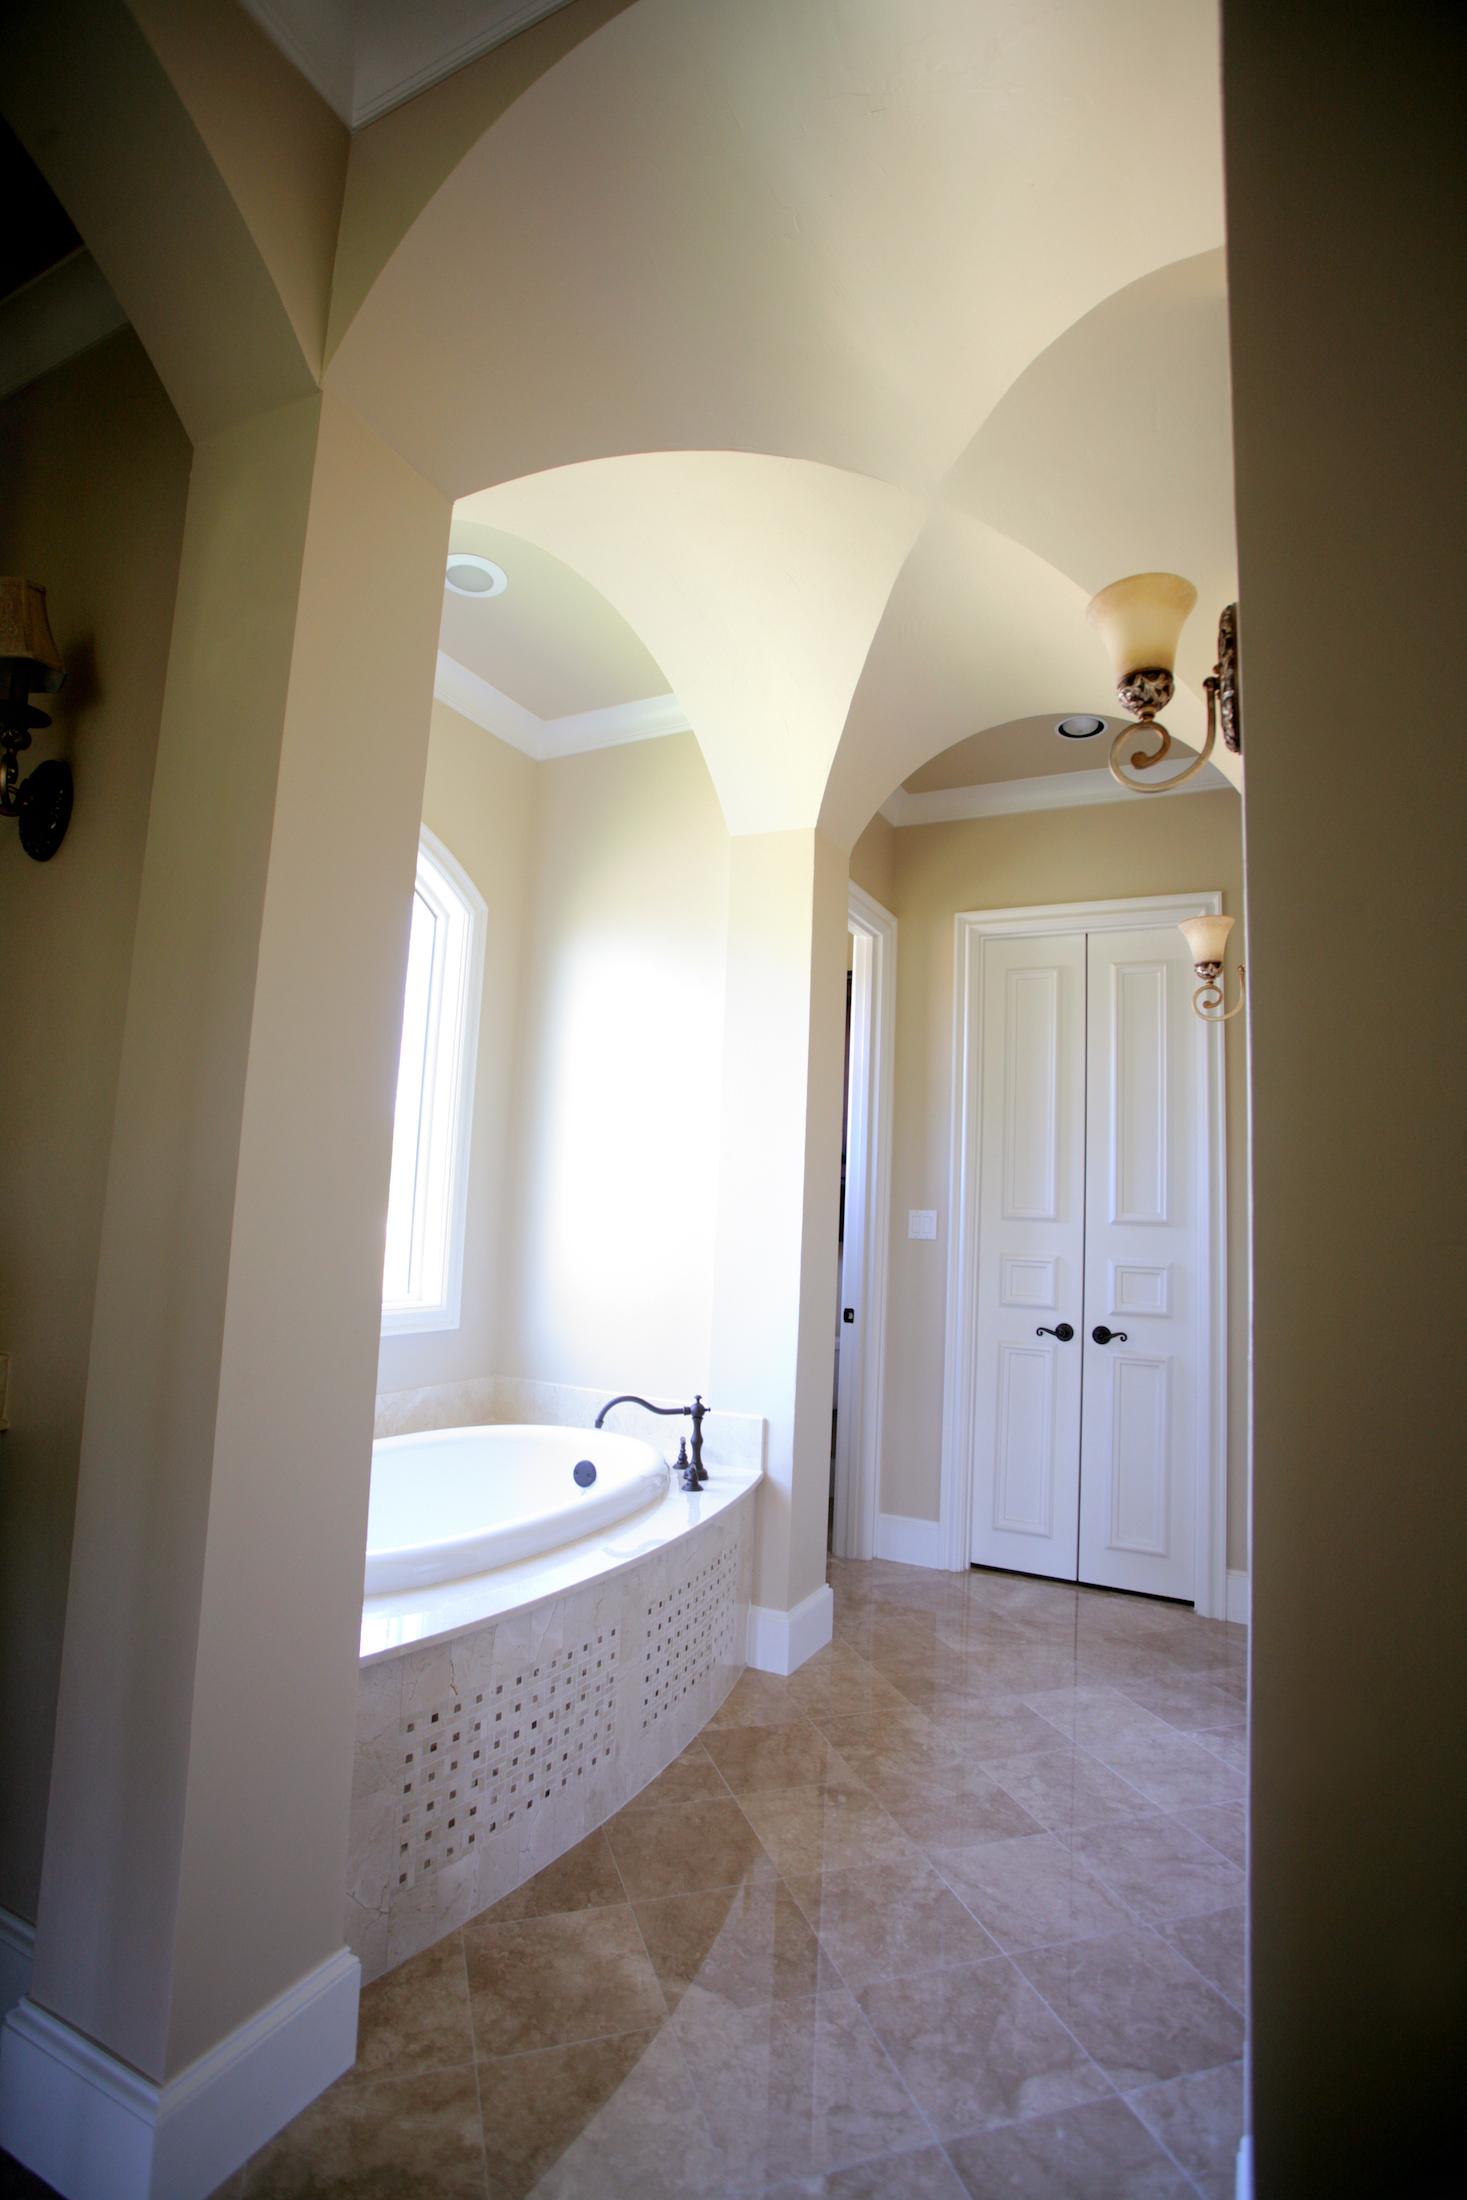 Bathroom Design (Custom Texas Homes): Groin Arch in Master Bath